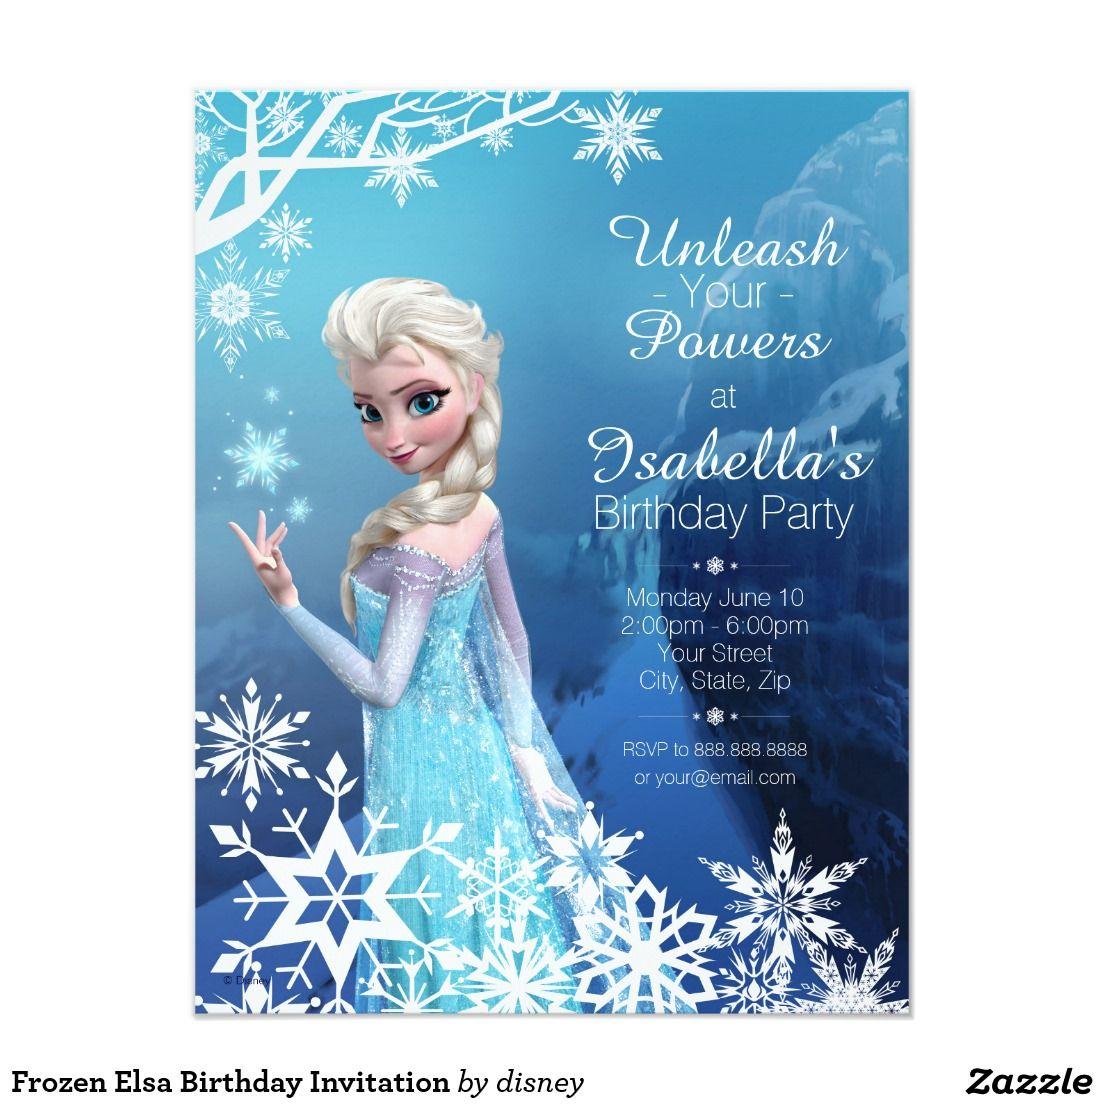 Frozen Elsa Birthday Invitation 4 25 X 5 5 Invitation Card Elsa Birthday Invitations Frozen Birthday Invitations Frozen Themed Birthday Party